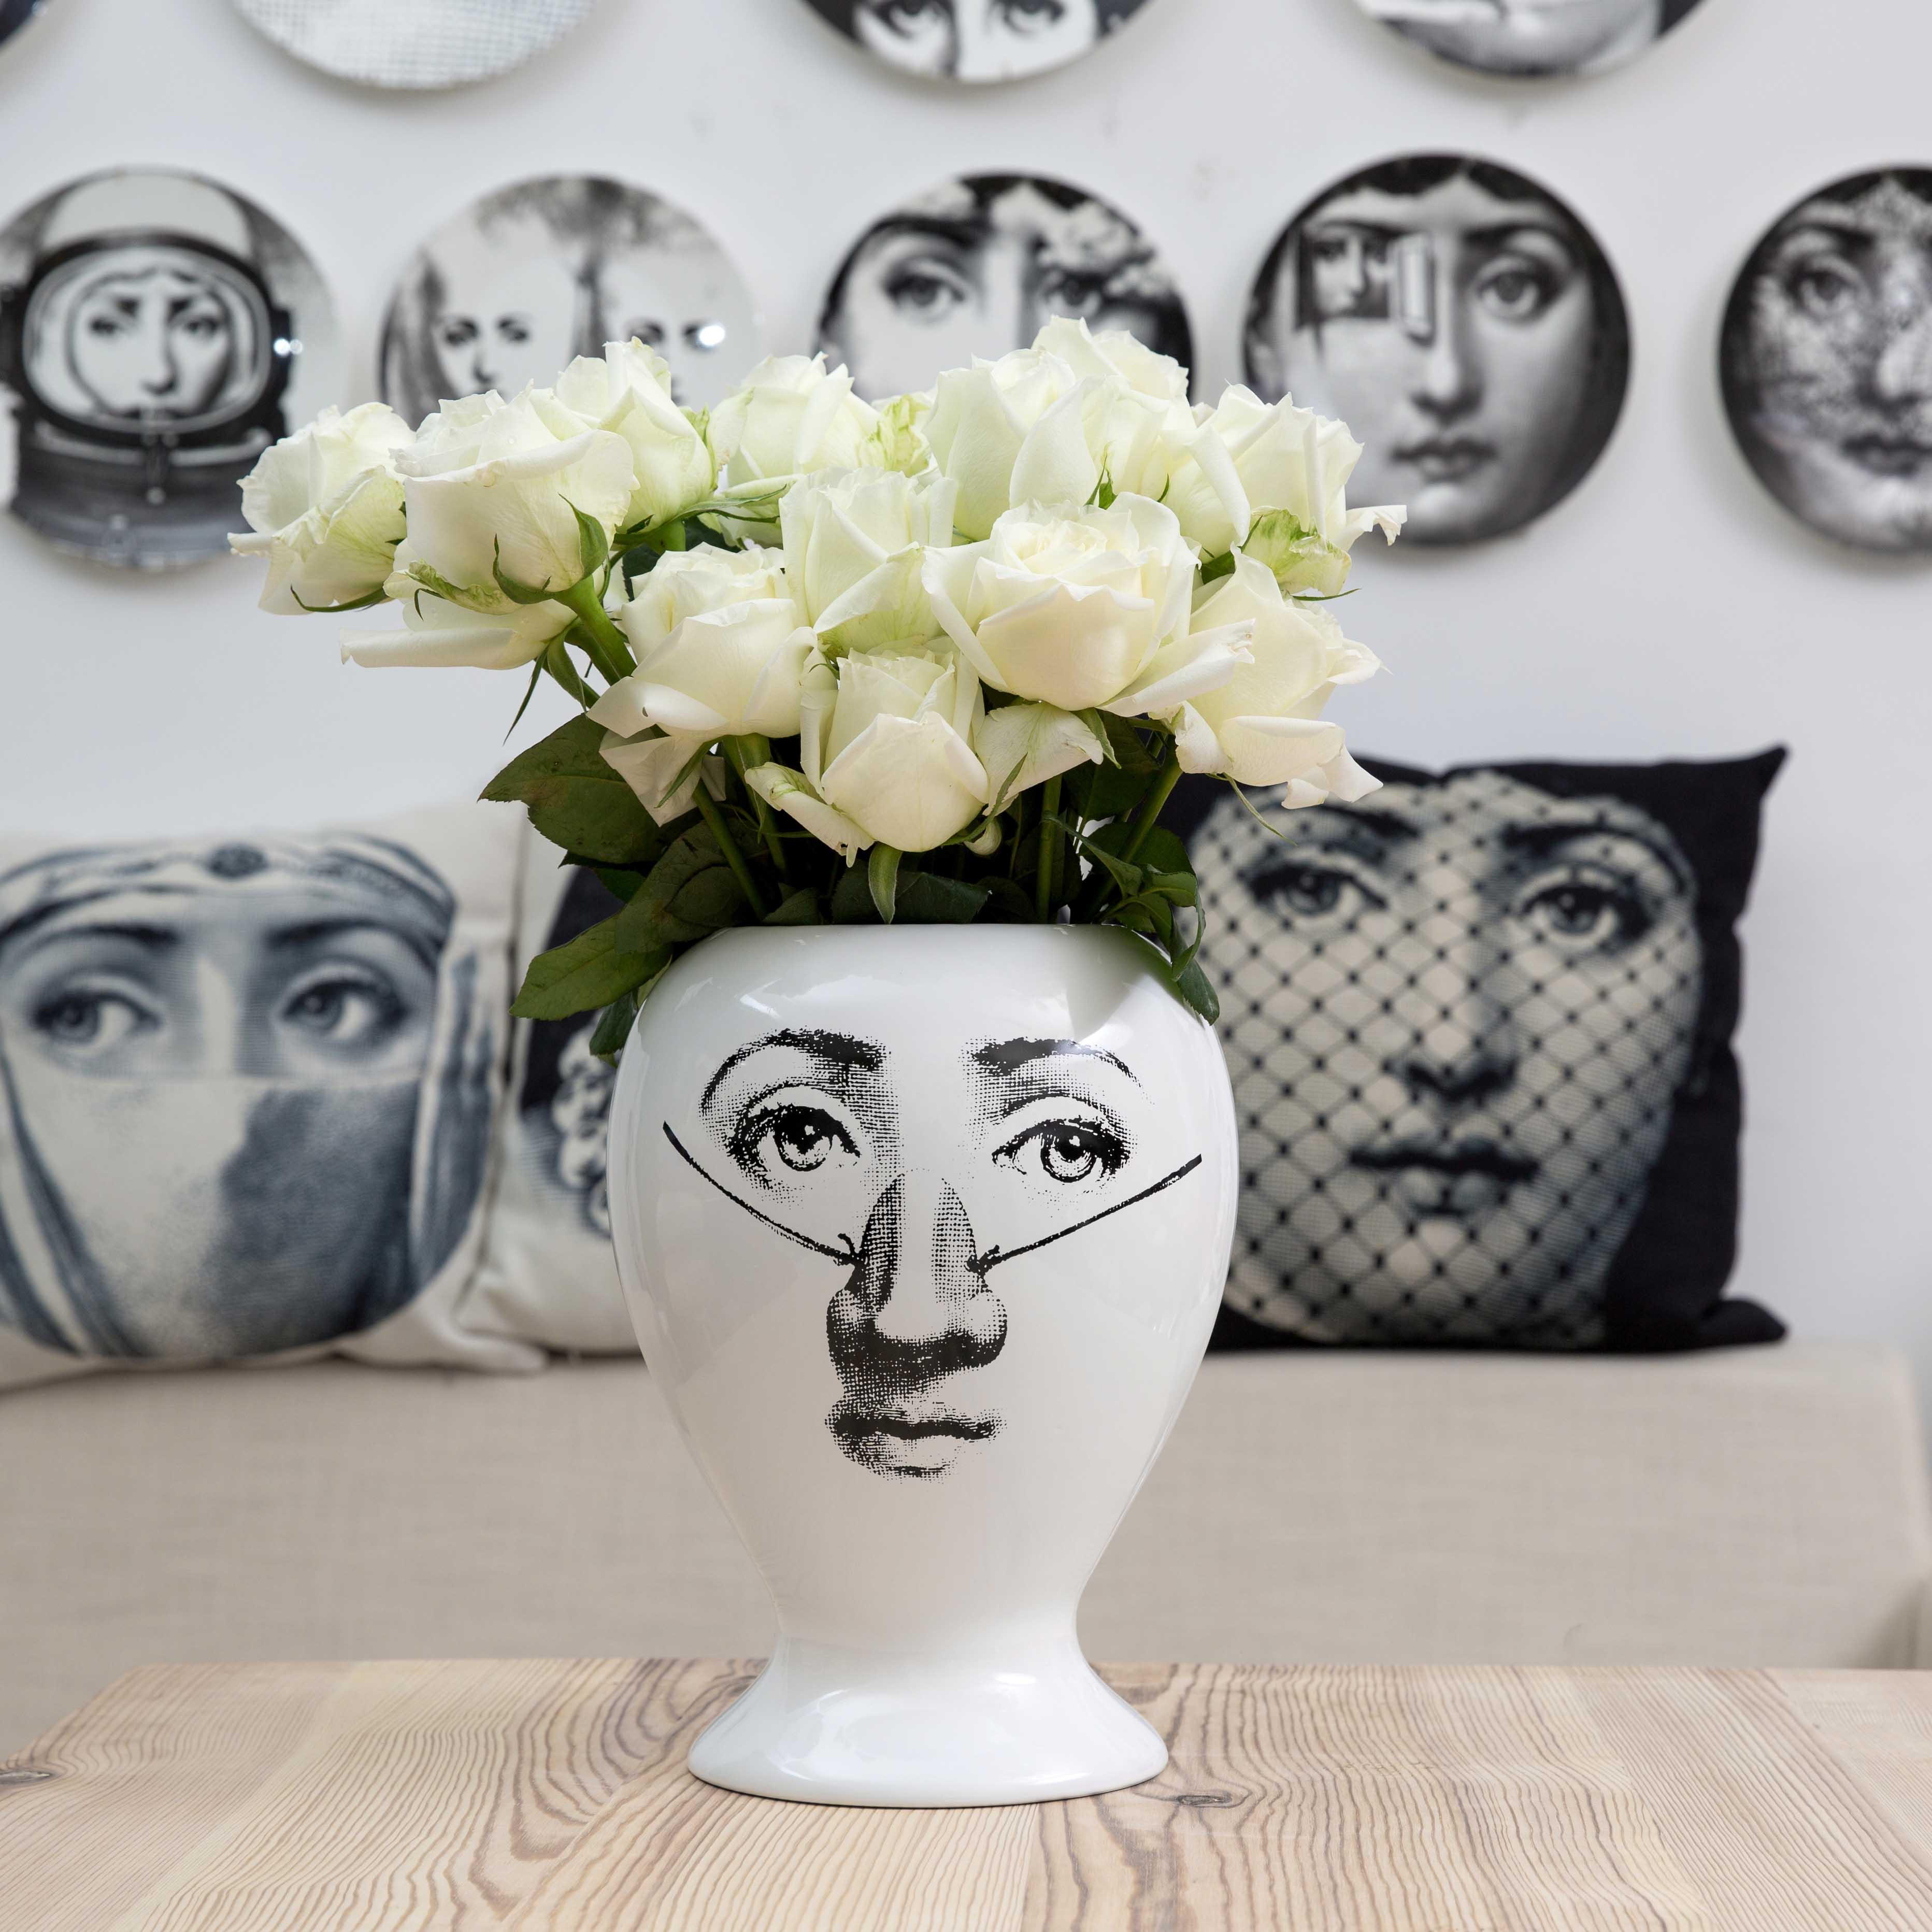 2018 New Creative Design Pattern Italy Milan Rosenthal Piero Fornasetti Vase  Living Room Decorated Vase Porcelain Vase-in Vases from Home & Garden on ...